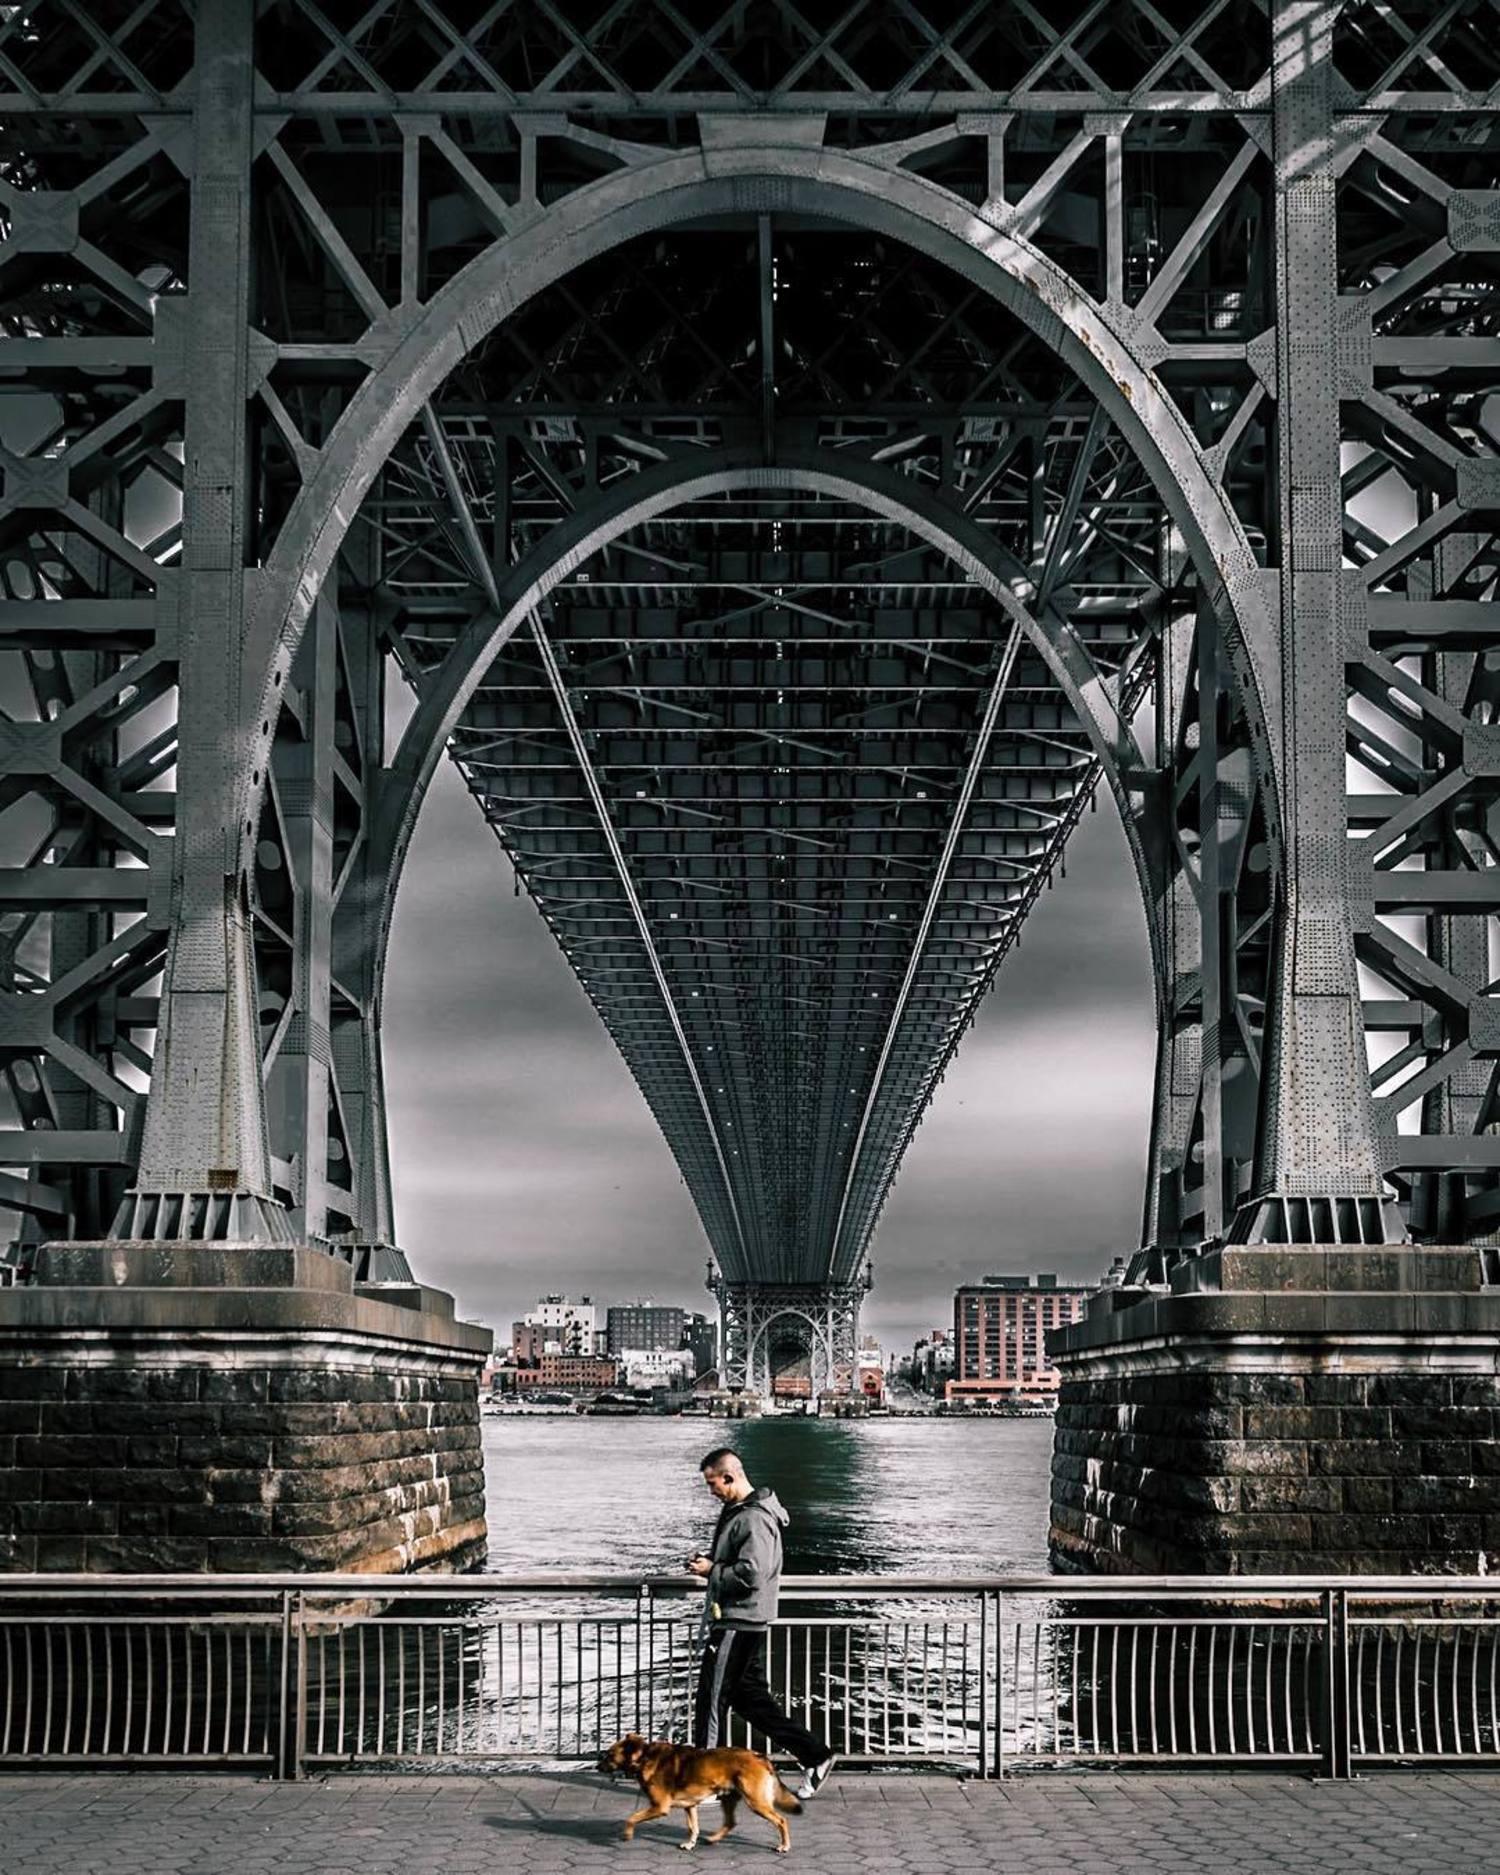 Under the Williamsburg Bridge, Brooklyn